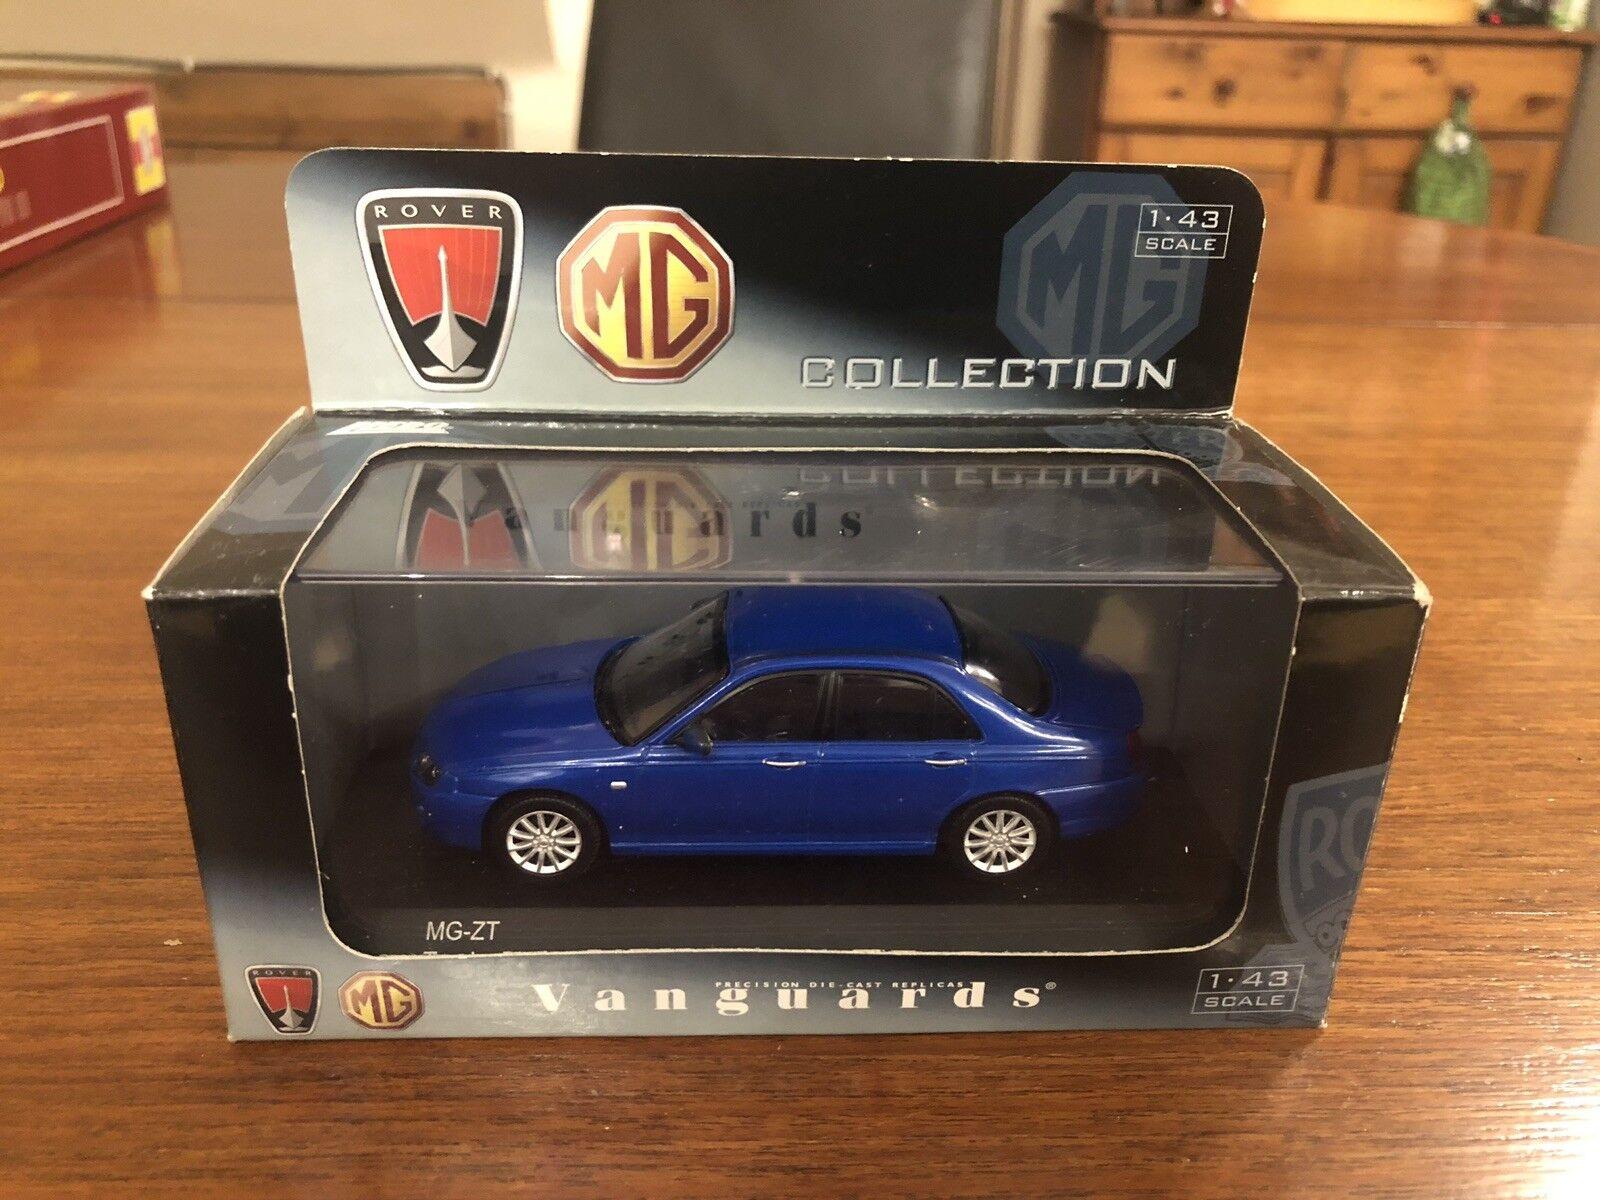 Vanguards 1 43 MG ZT Facelift Trophy bluee VA09300 Corgi Lledo BNIB MINT